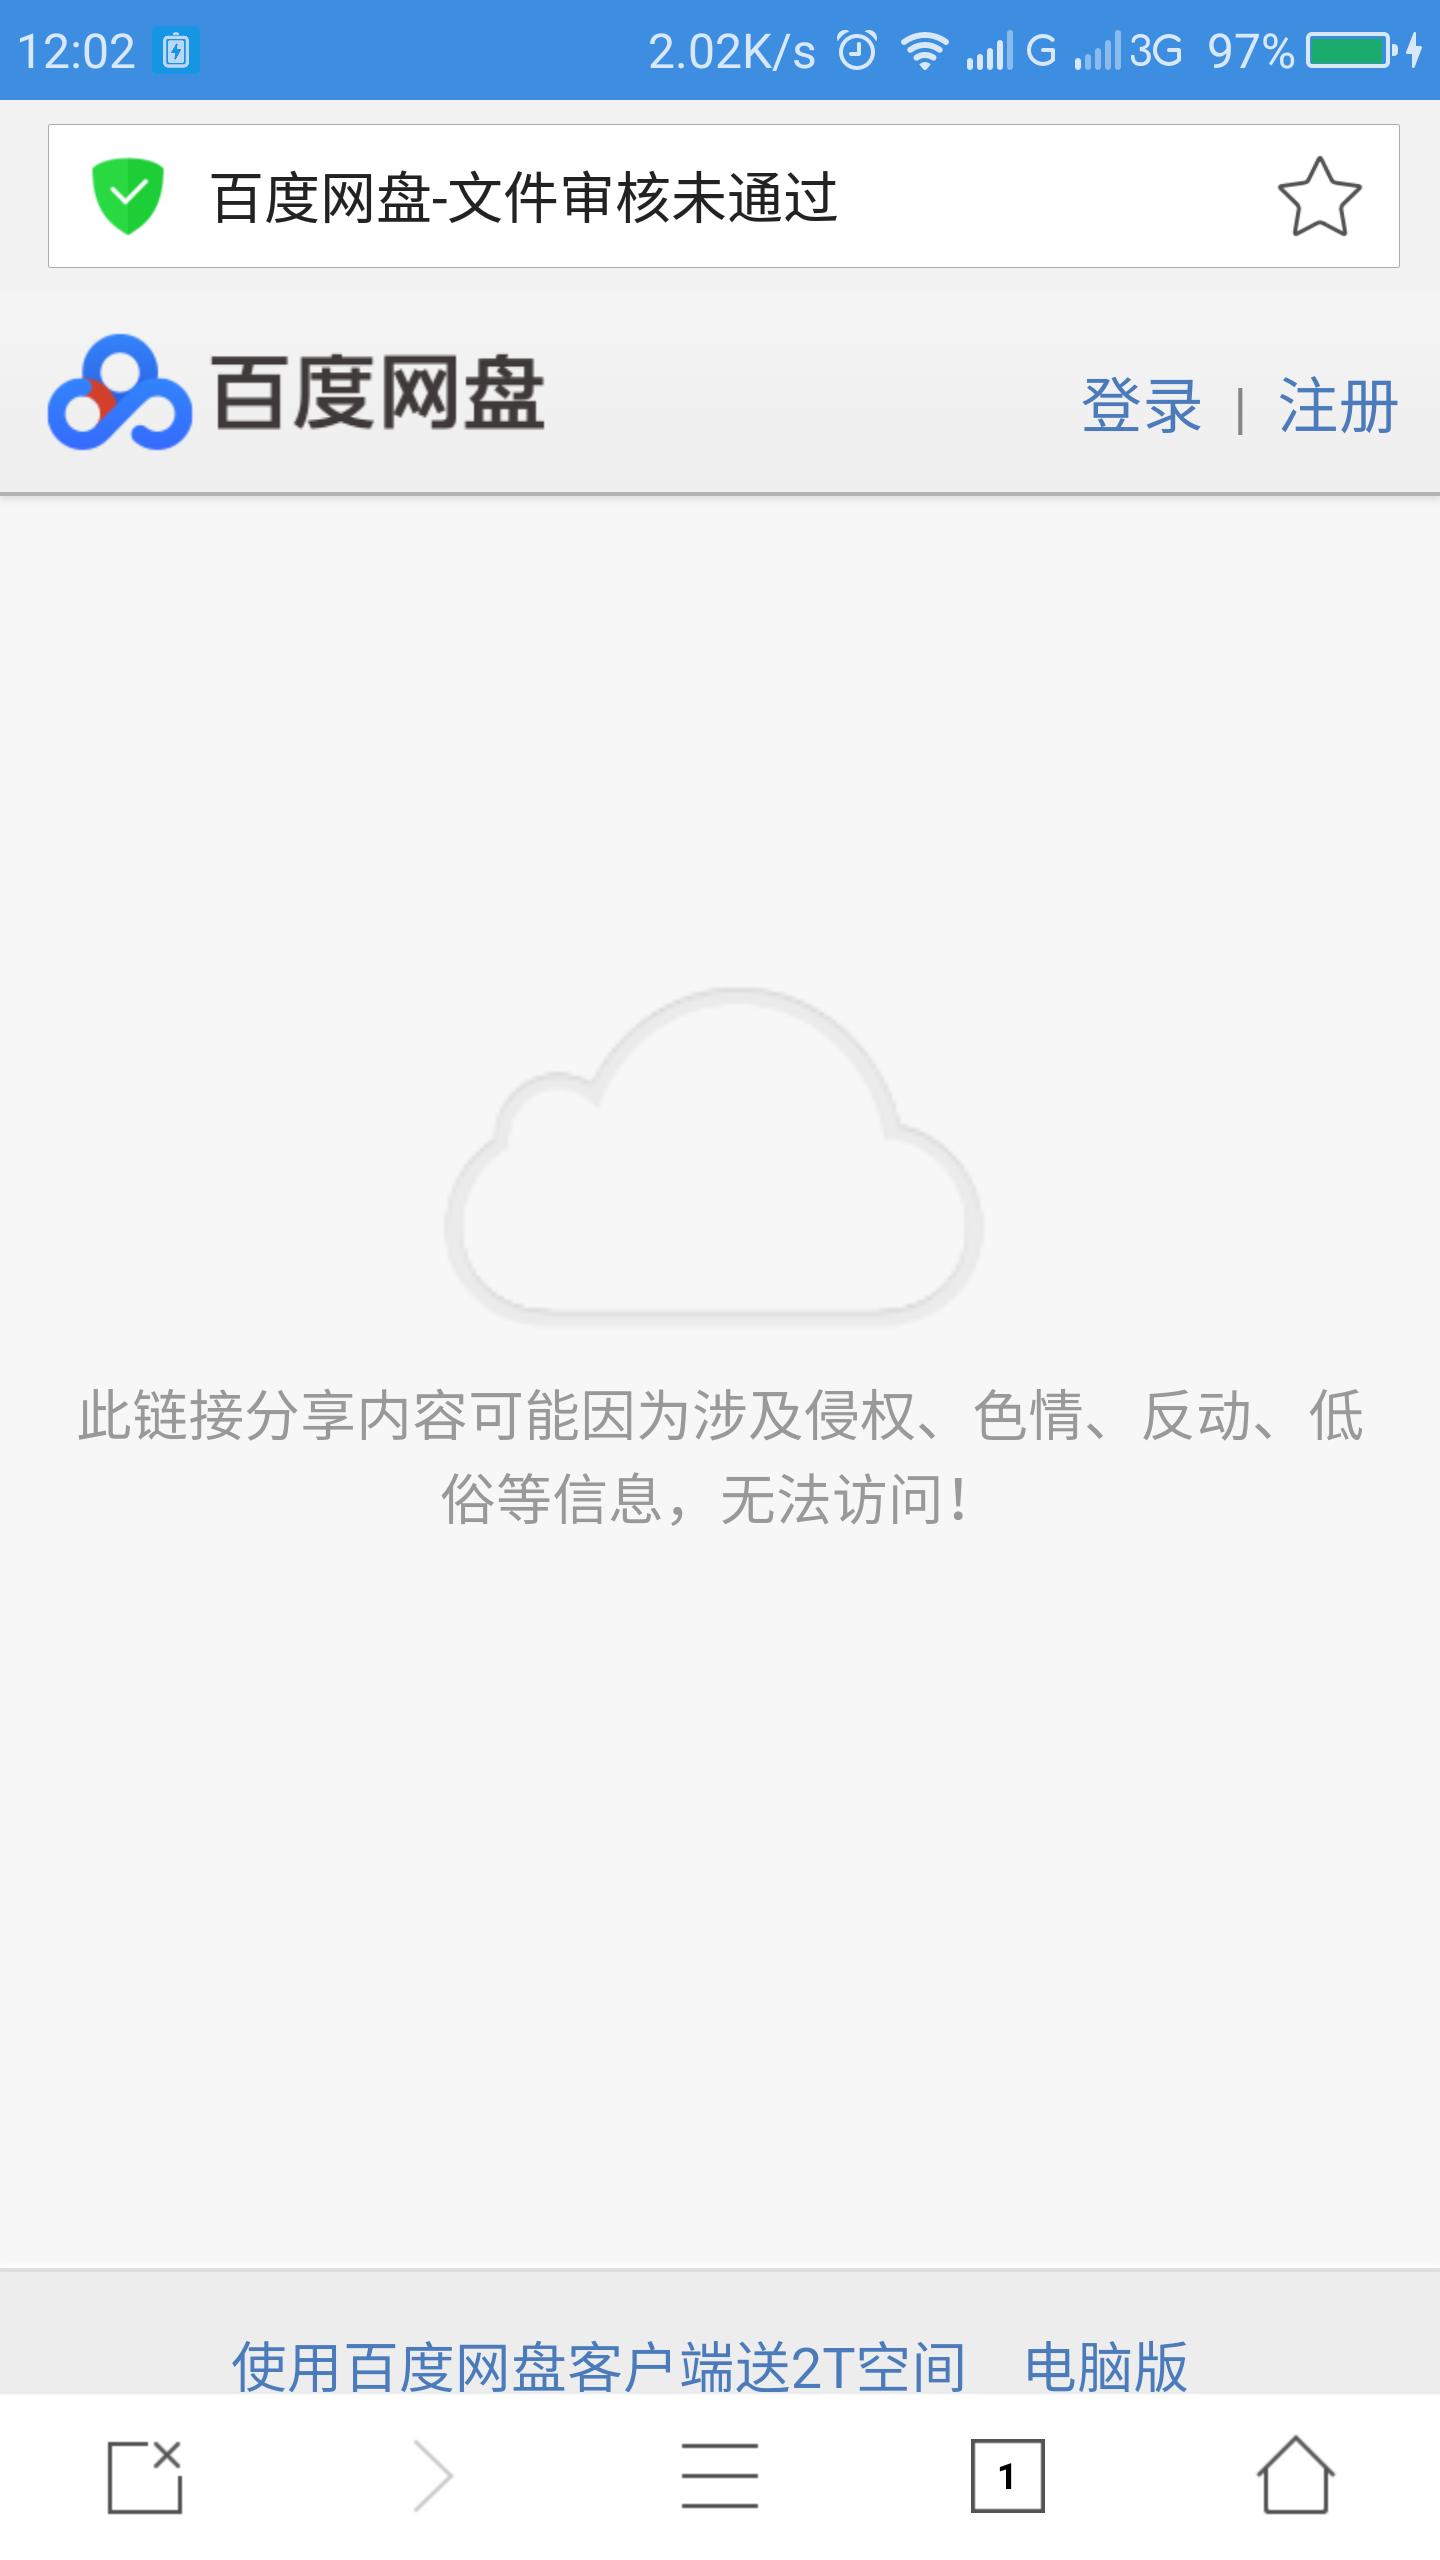 Screenshot_2017-04-03-12-03-01.png